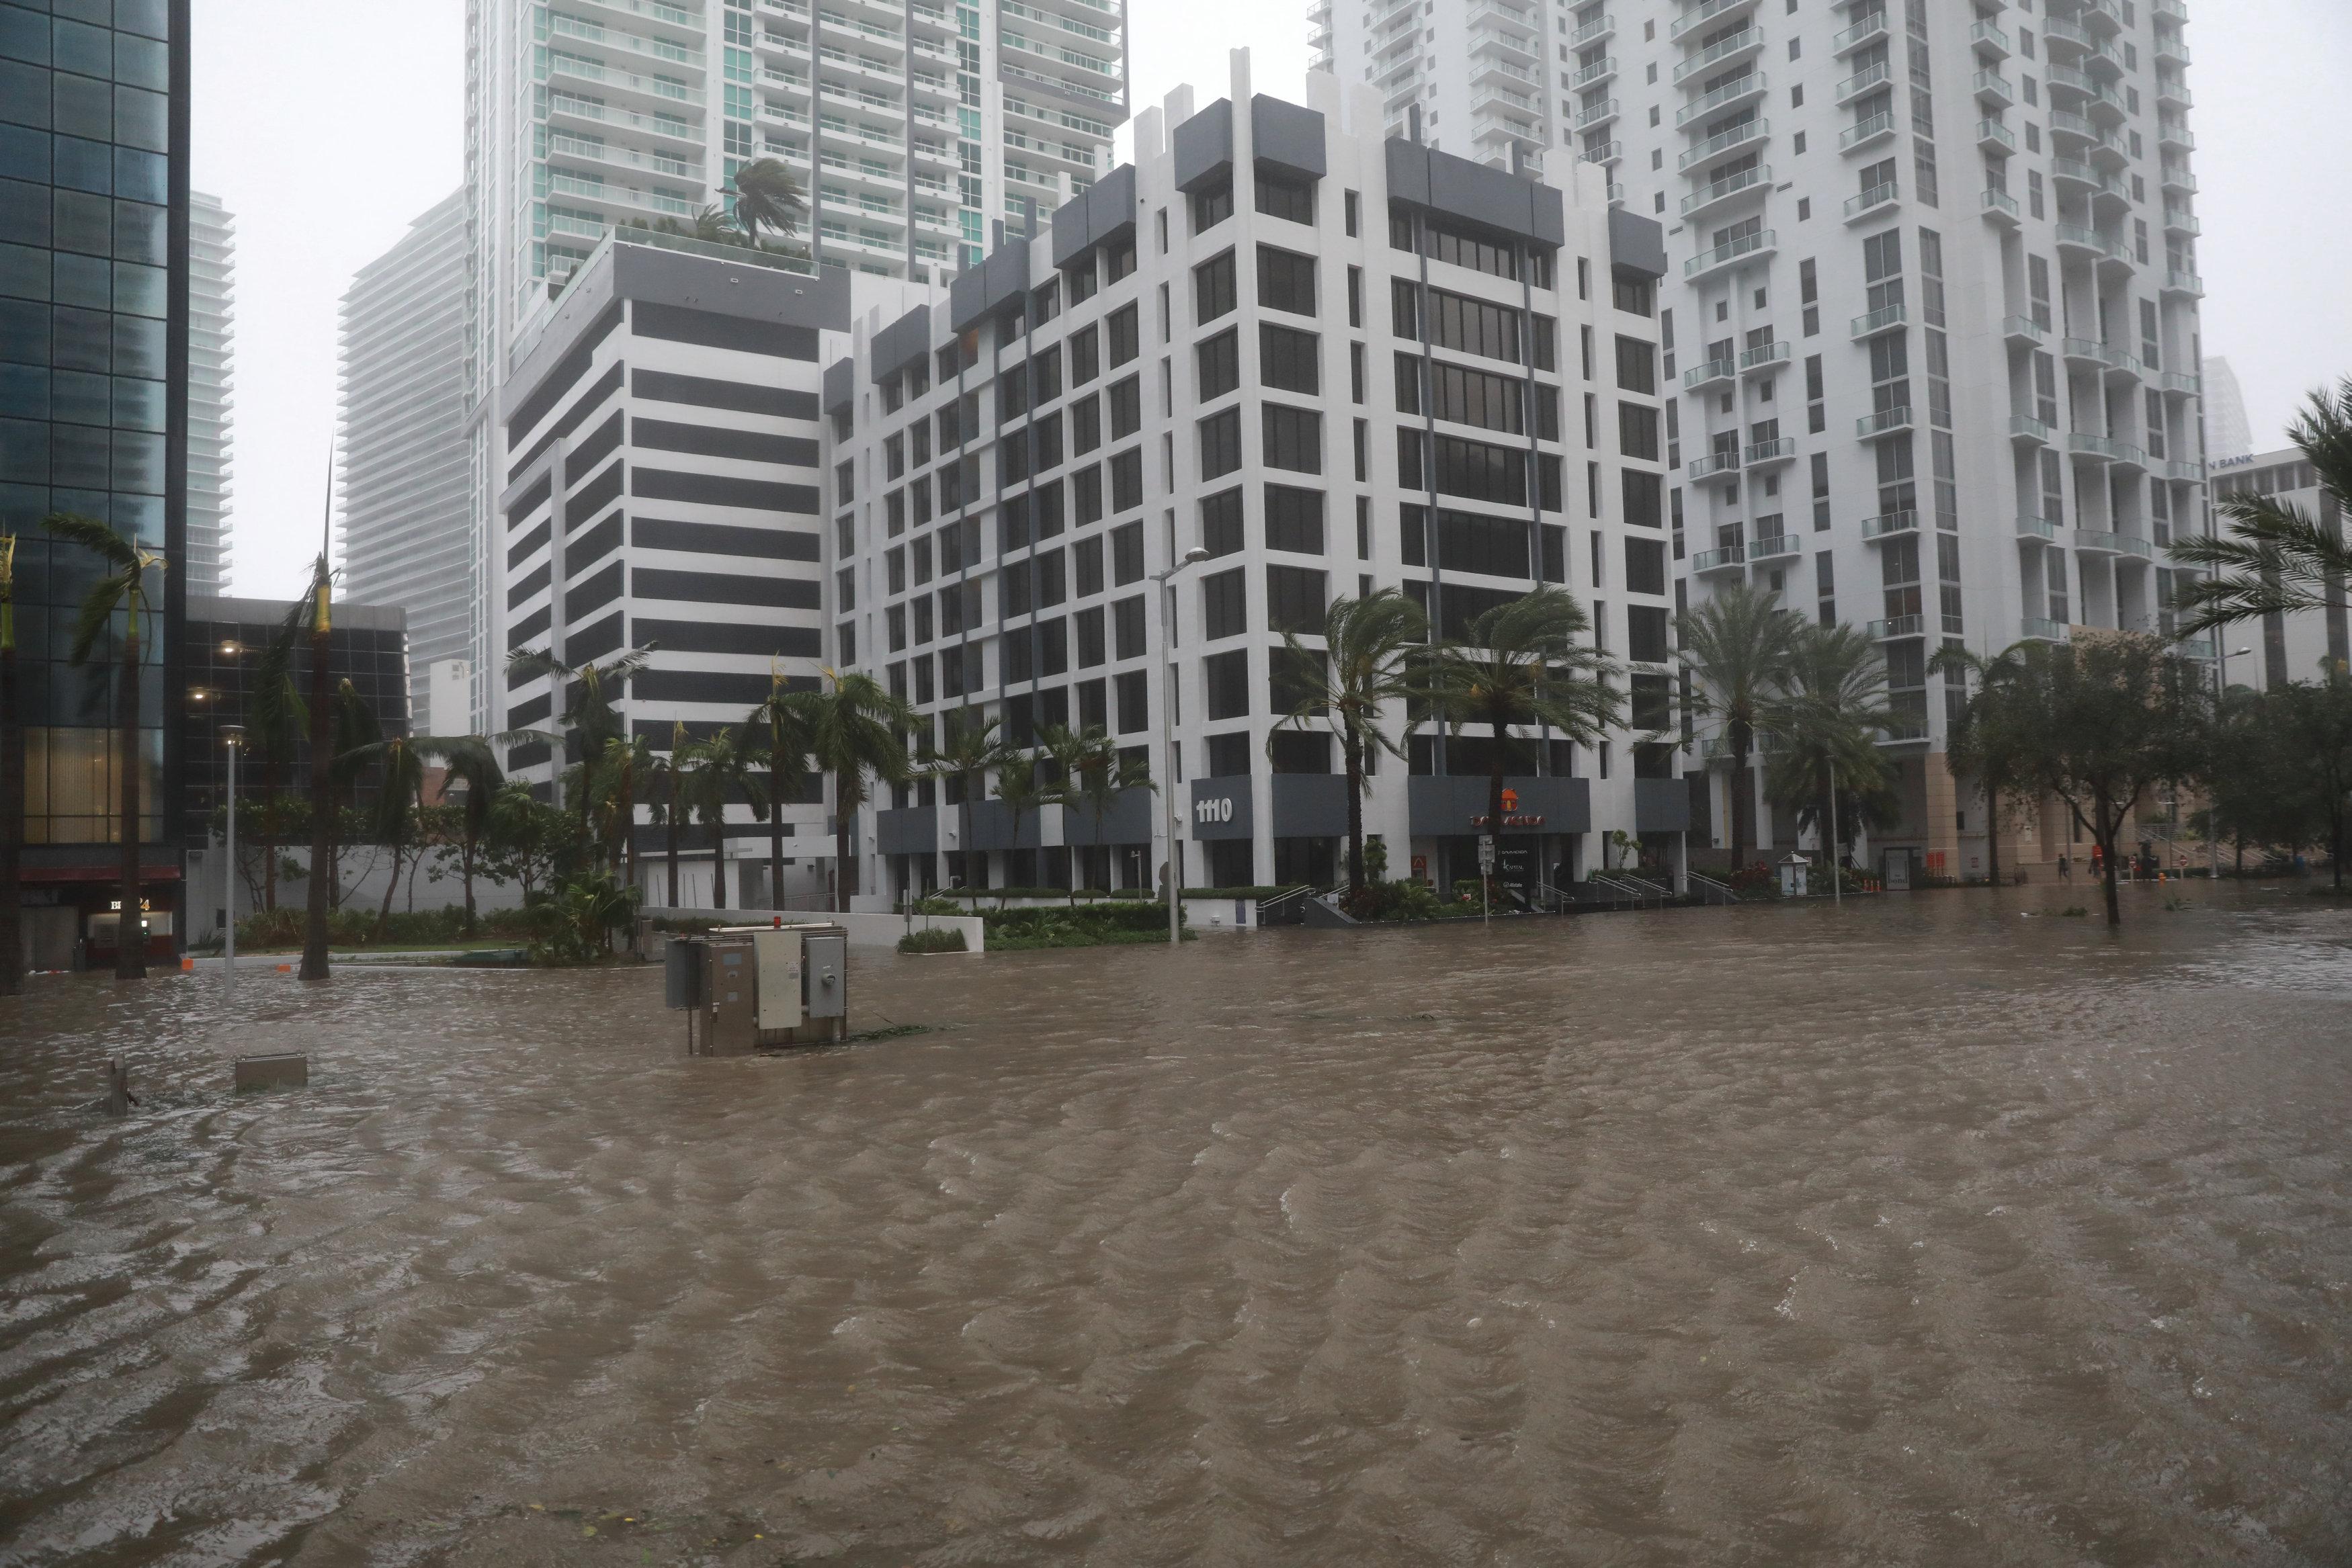 Flooding in the Brickell neighborhood as Hurricane Irma passes Miami, Florida on Sept. 10, 2017. (REUTERS/Stephen Yang)